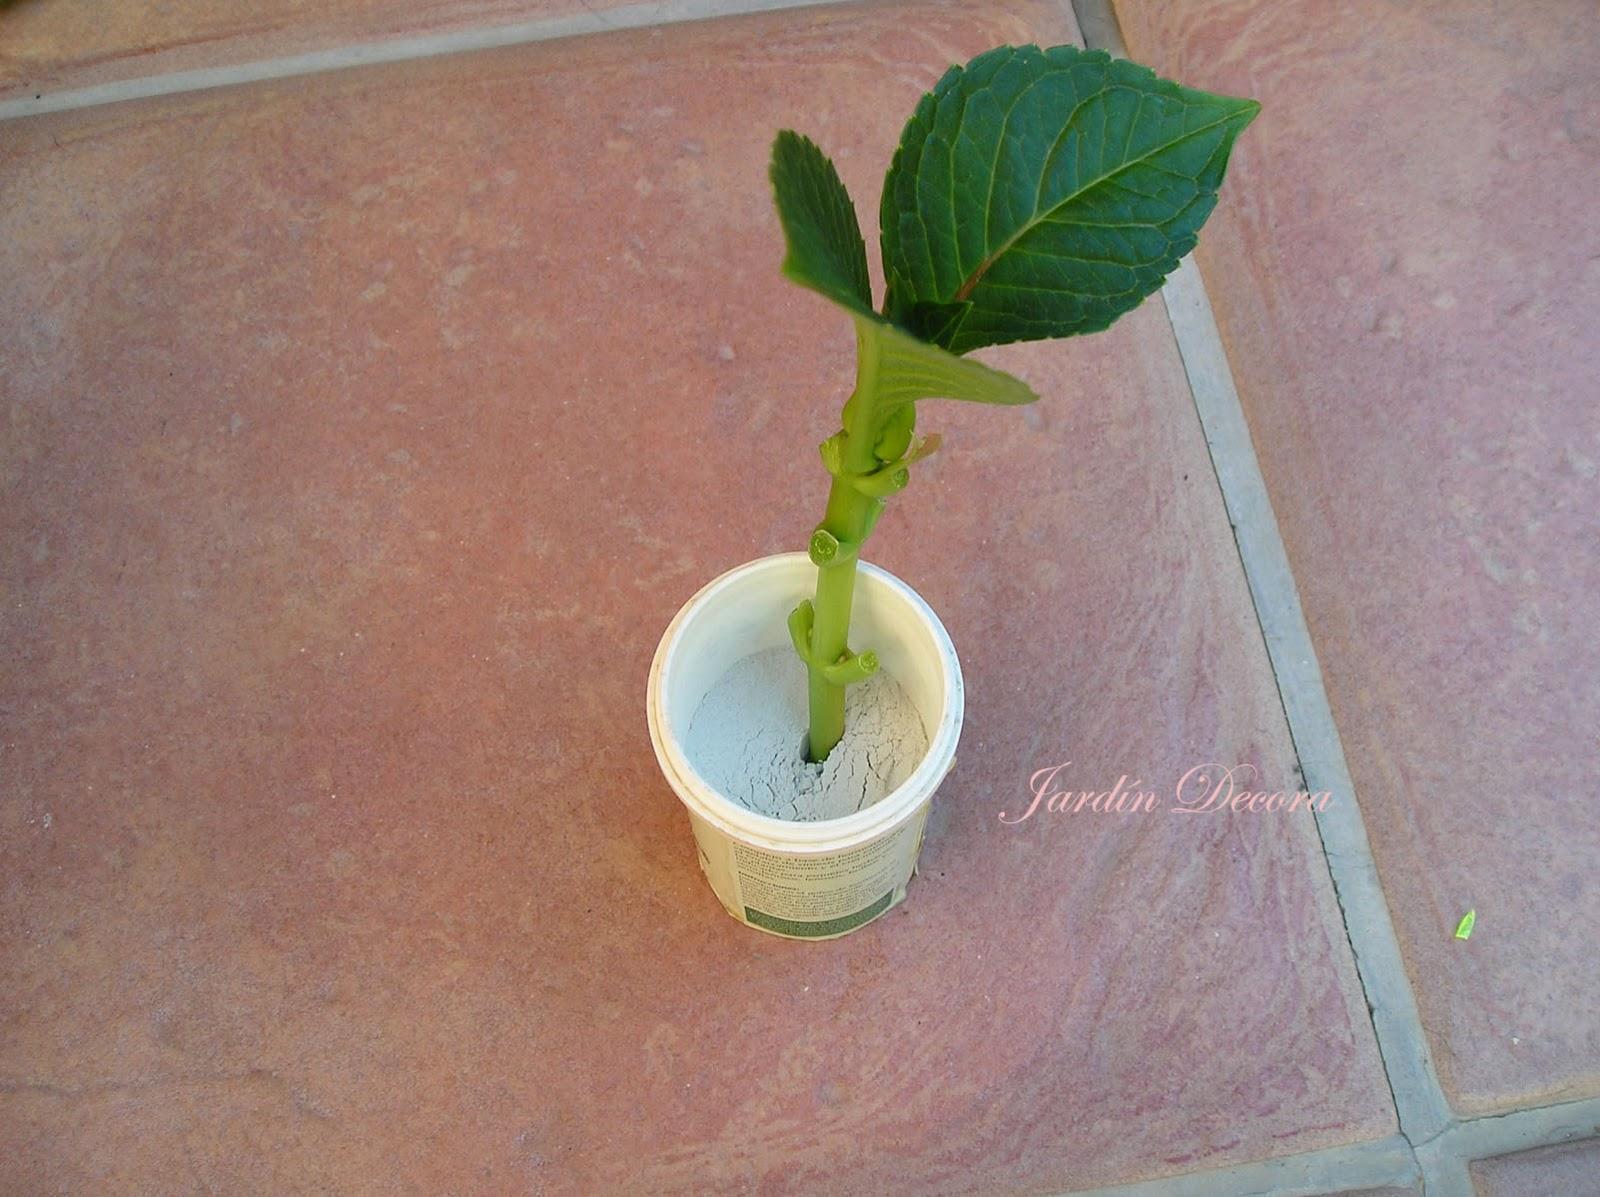 Esquejes de hortensias paso a paso paperblog - Como cuidar hortensias en maceta ...